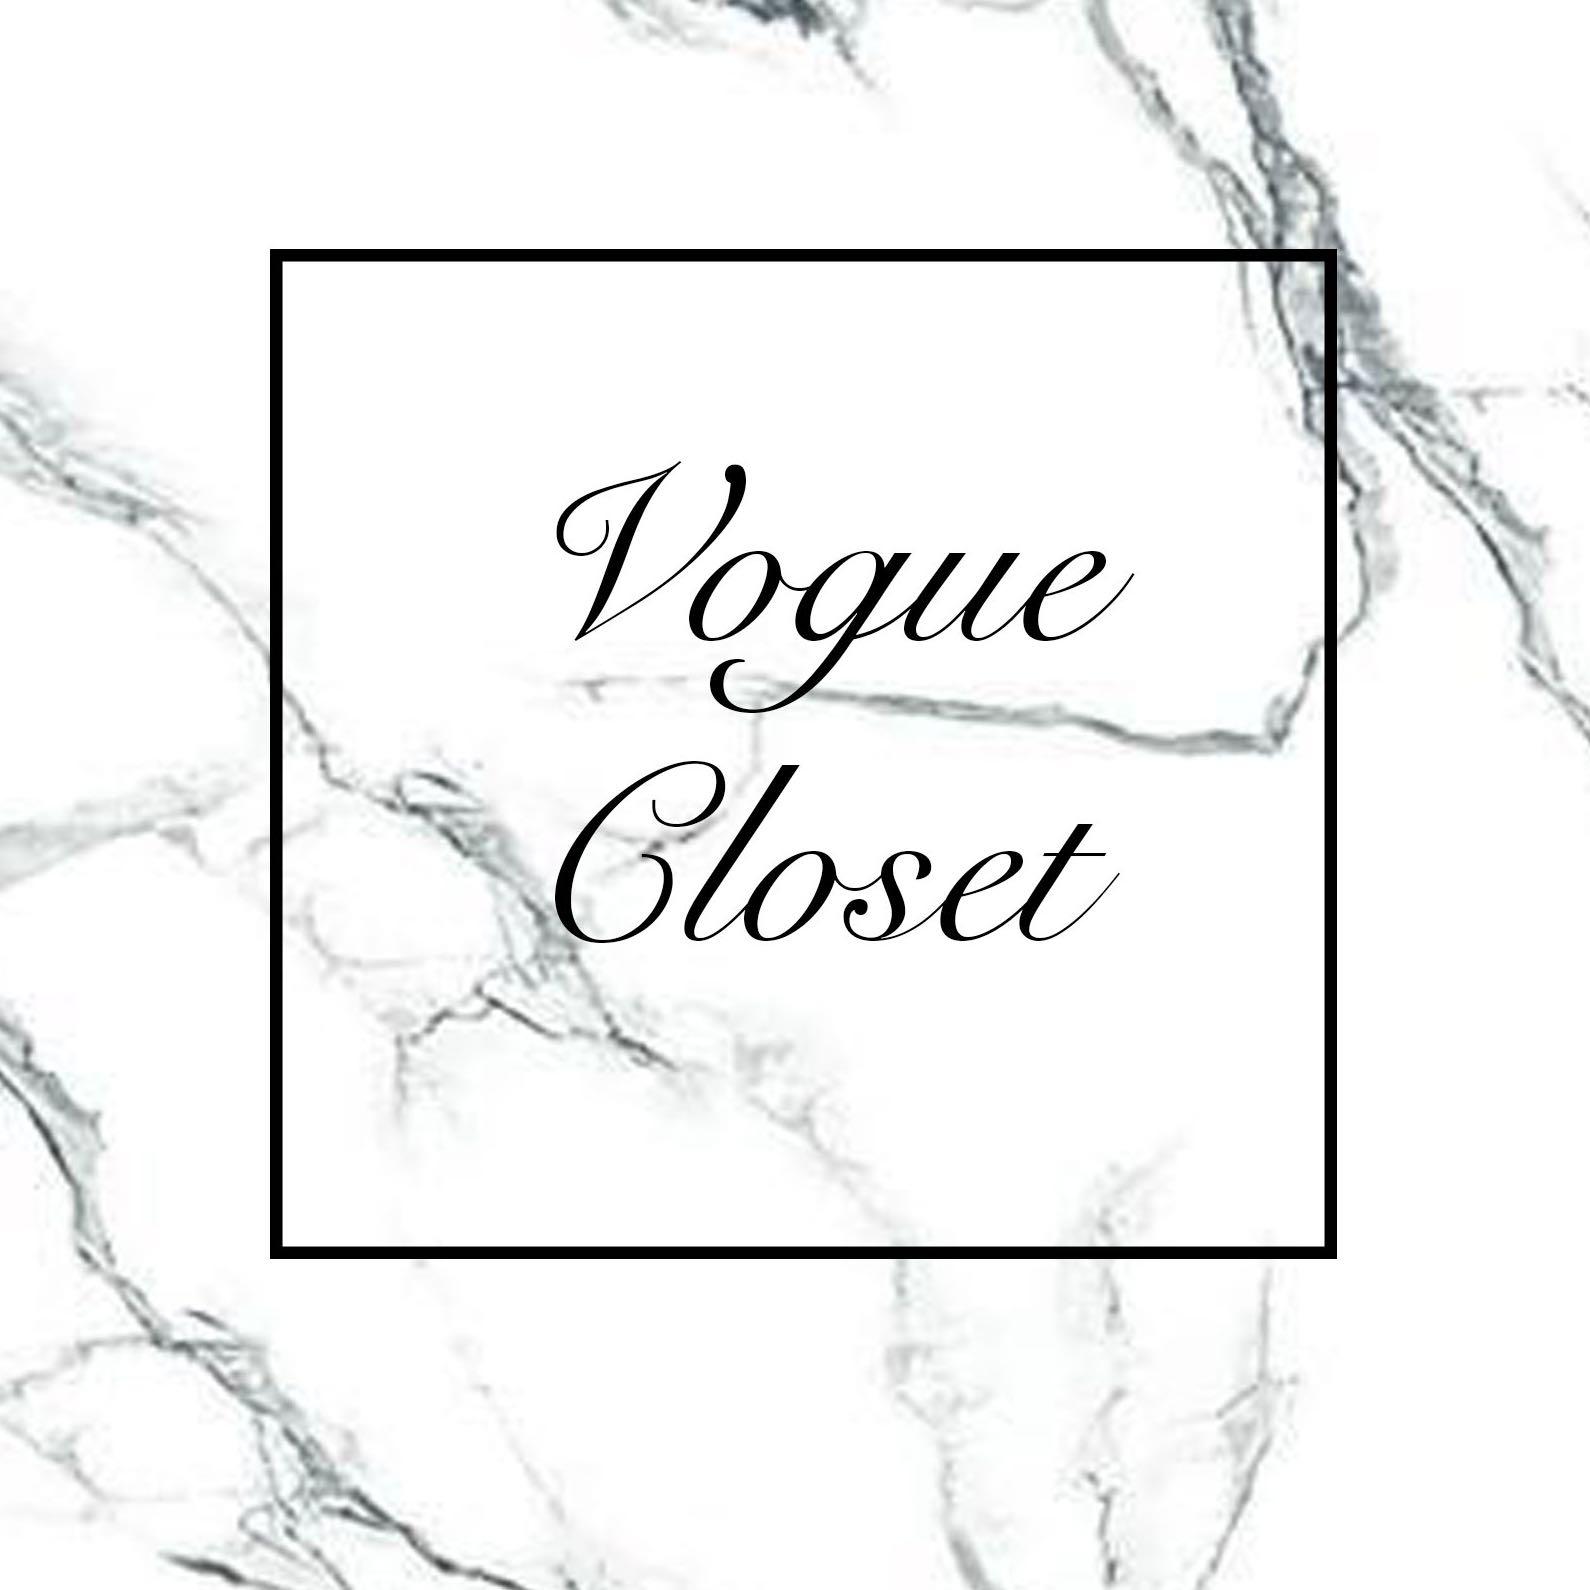 voguecloset